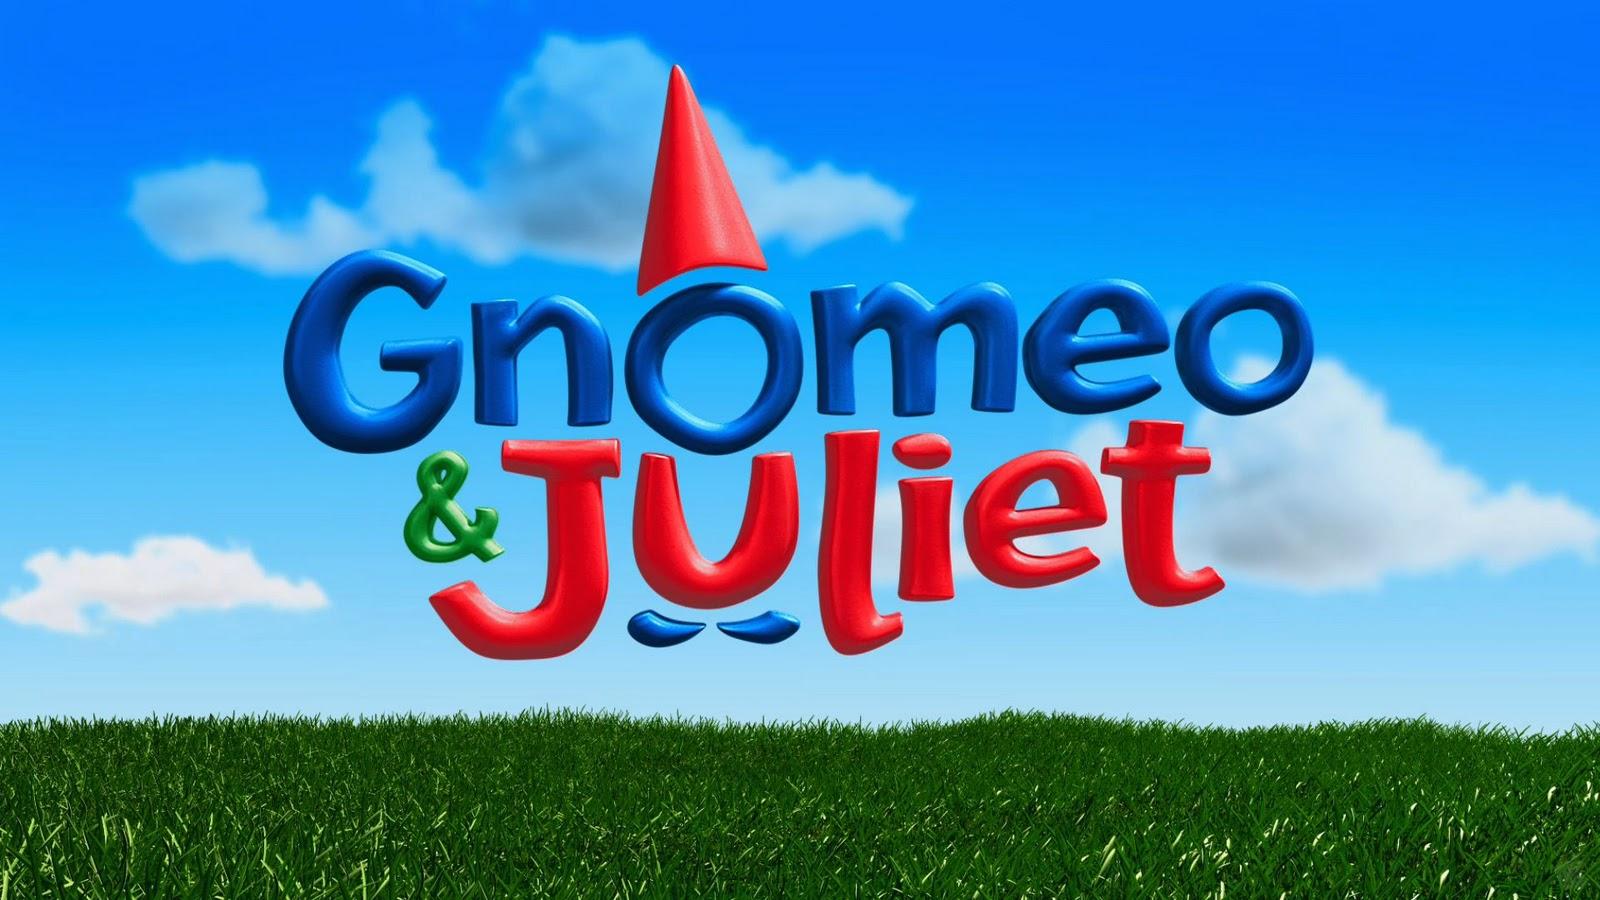 http://2.bp.blogspot.com/_lWbcNC7VYD8/TQjeH11epqI/AAAAAAAAAQM/JKxOrLjfuNg/s1600/Gnomeo-and-Juliet-Logo-Disney-Wallpaper.jpg